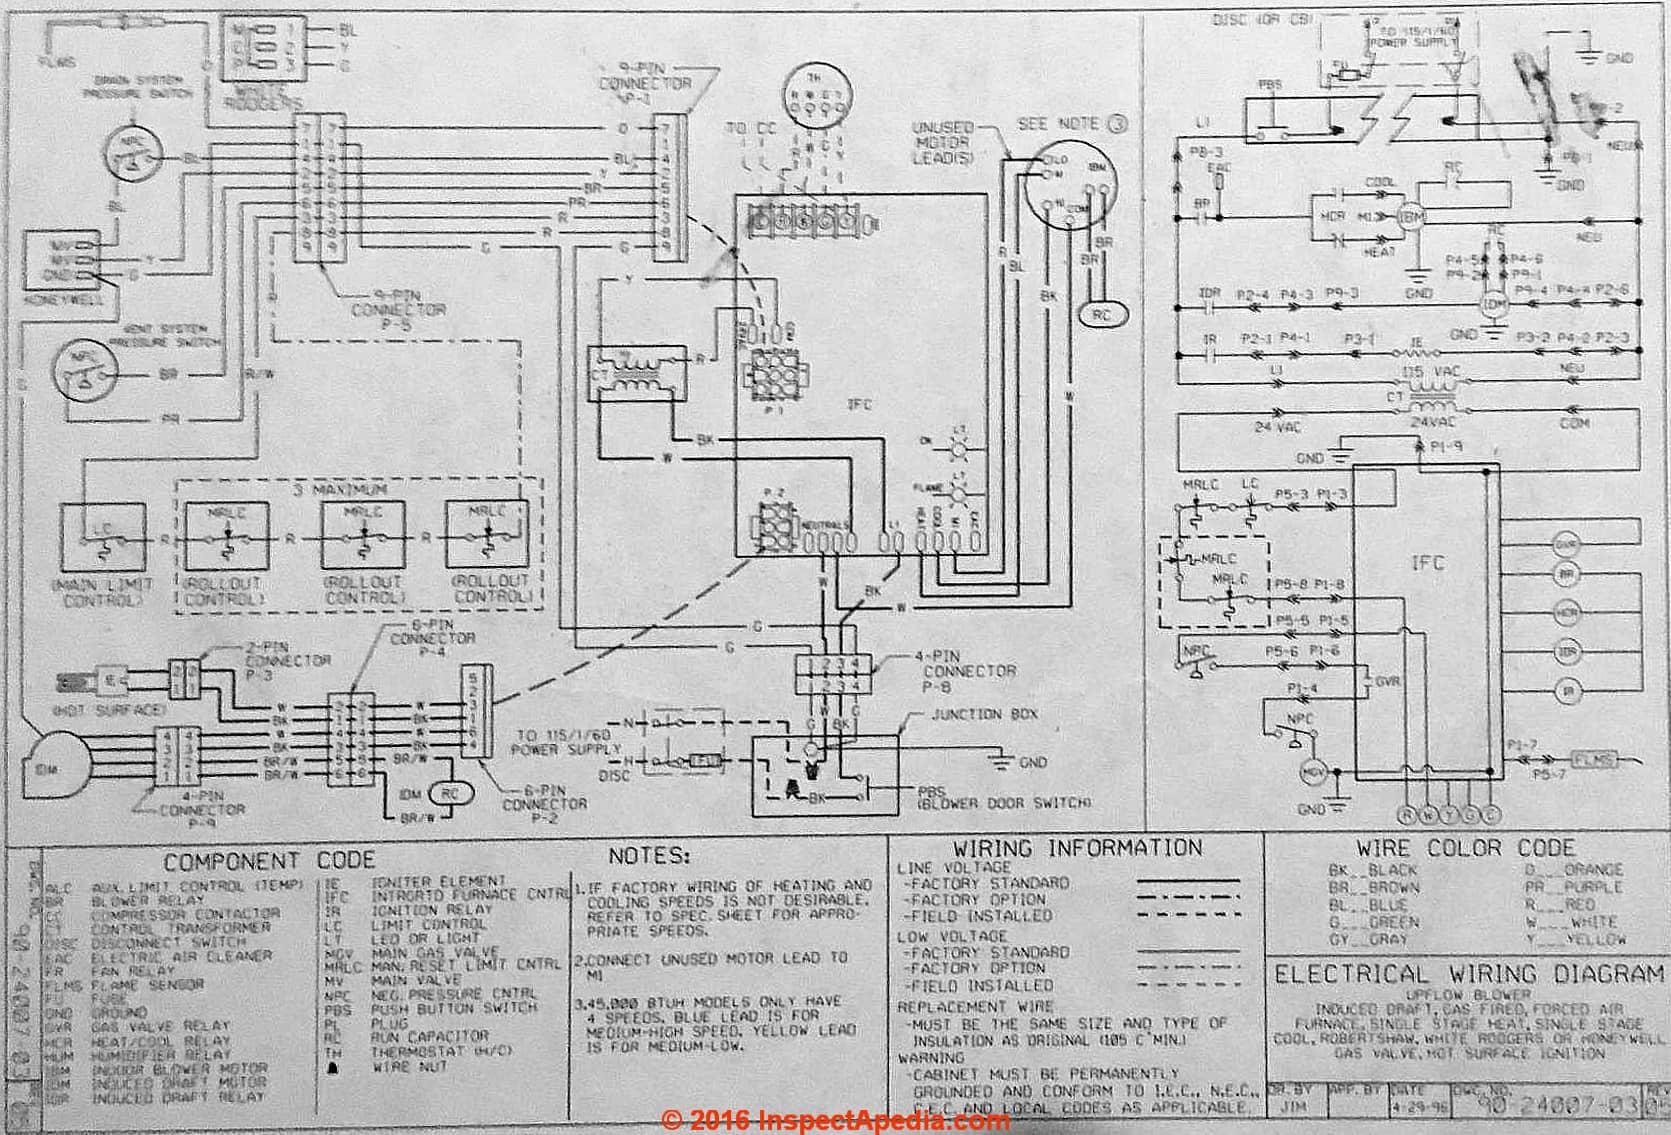 Air Conditioner / Heat Pump FAQs